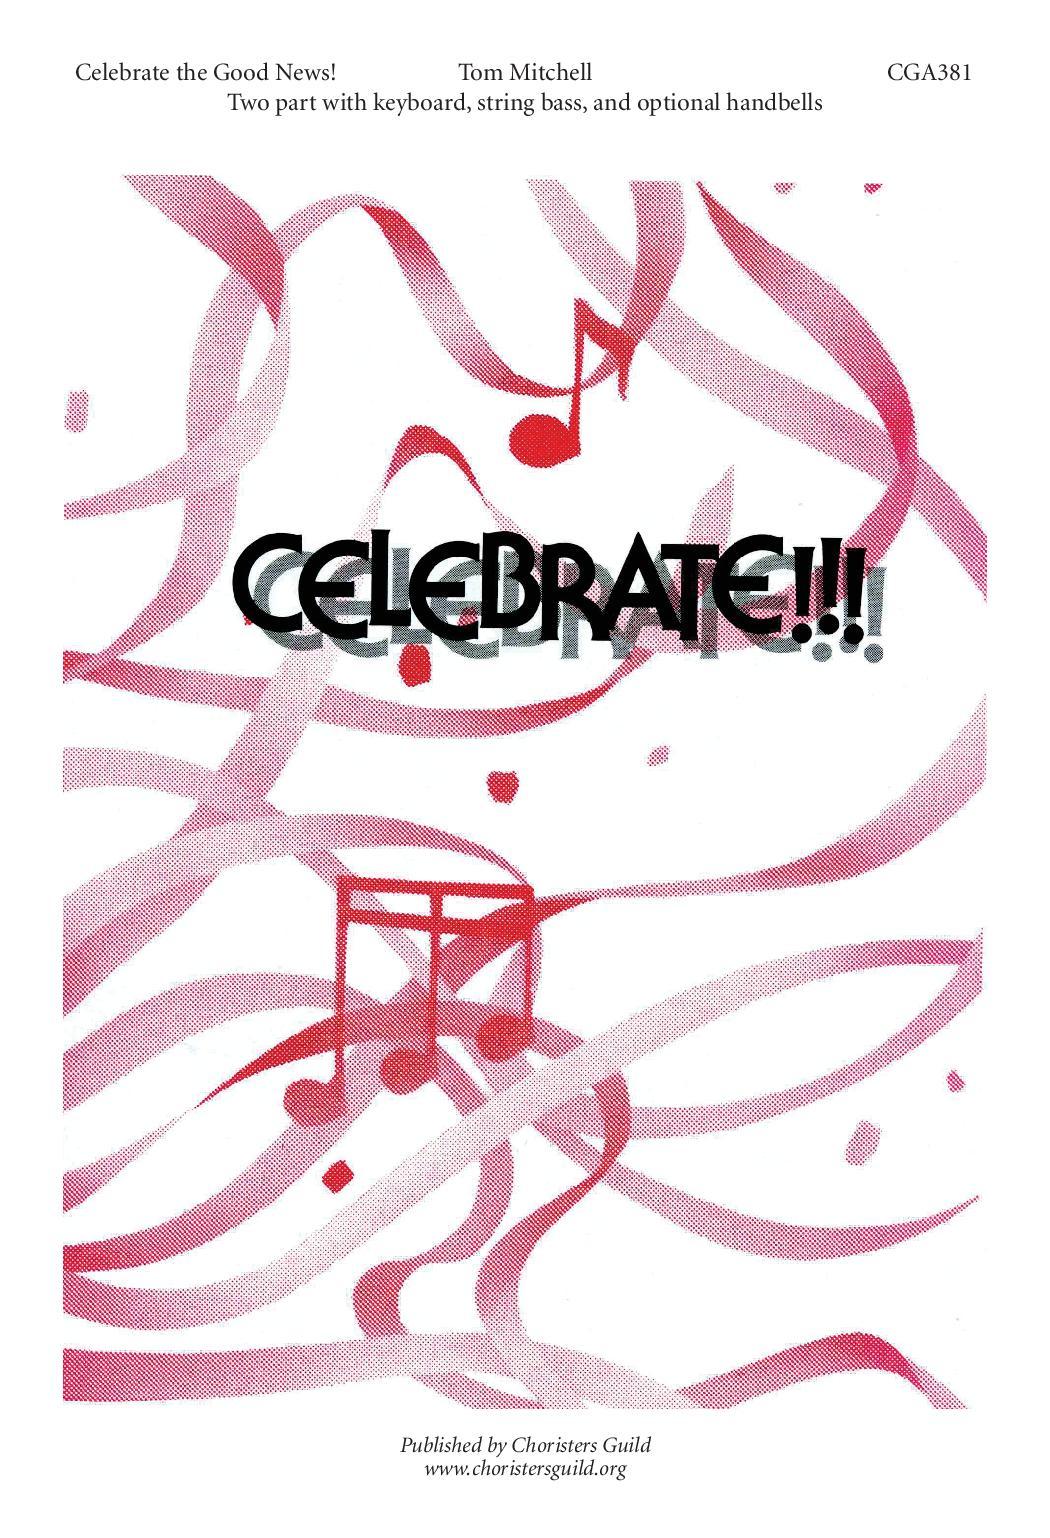 Celebrate the Good News